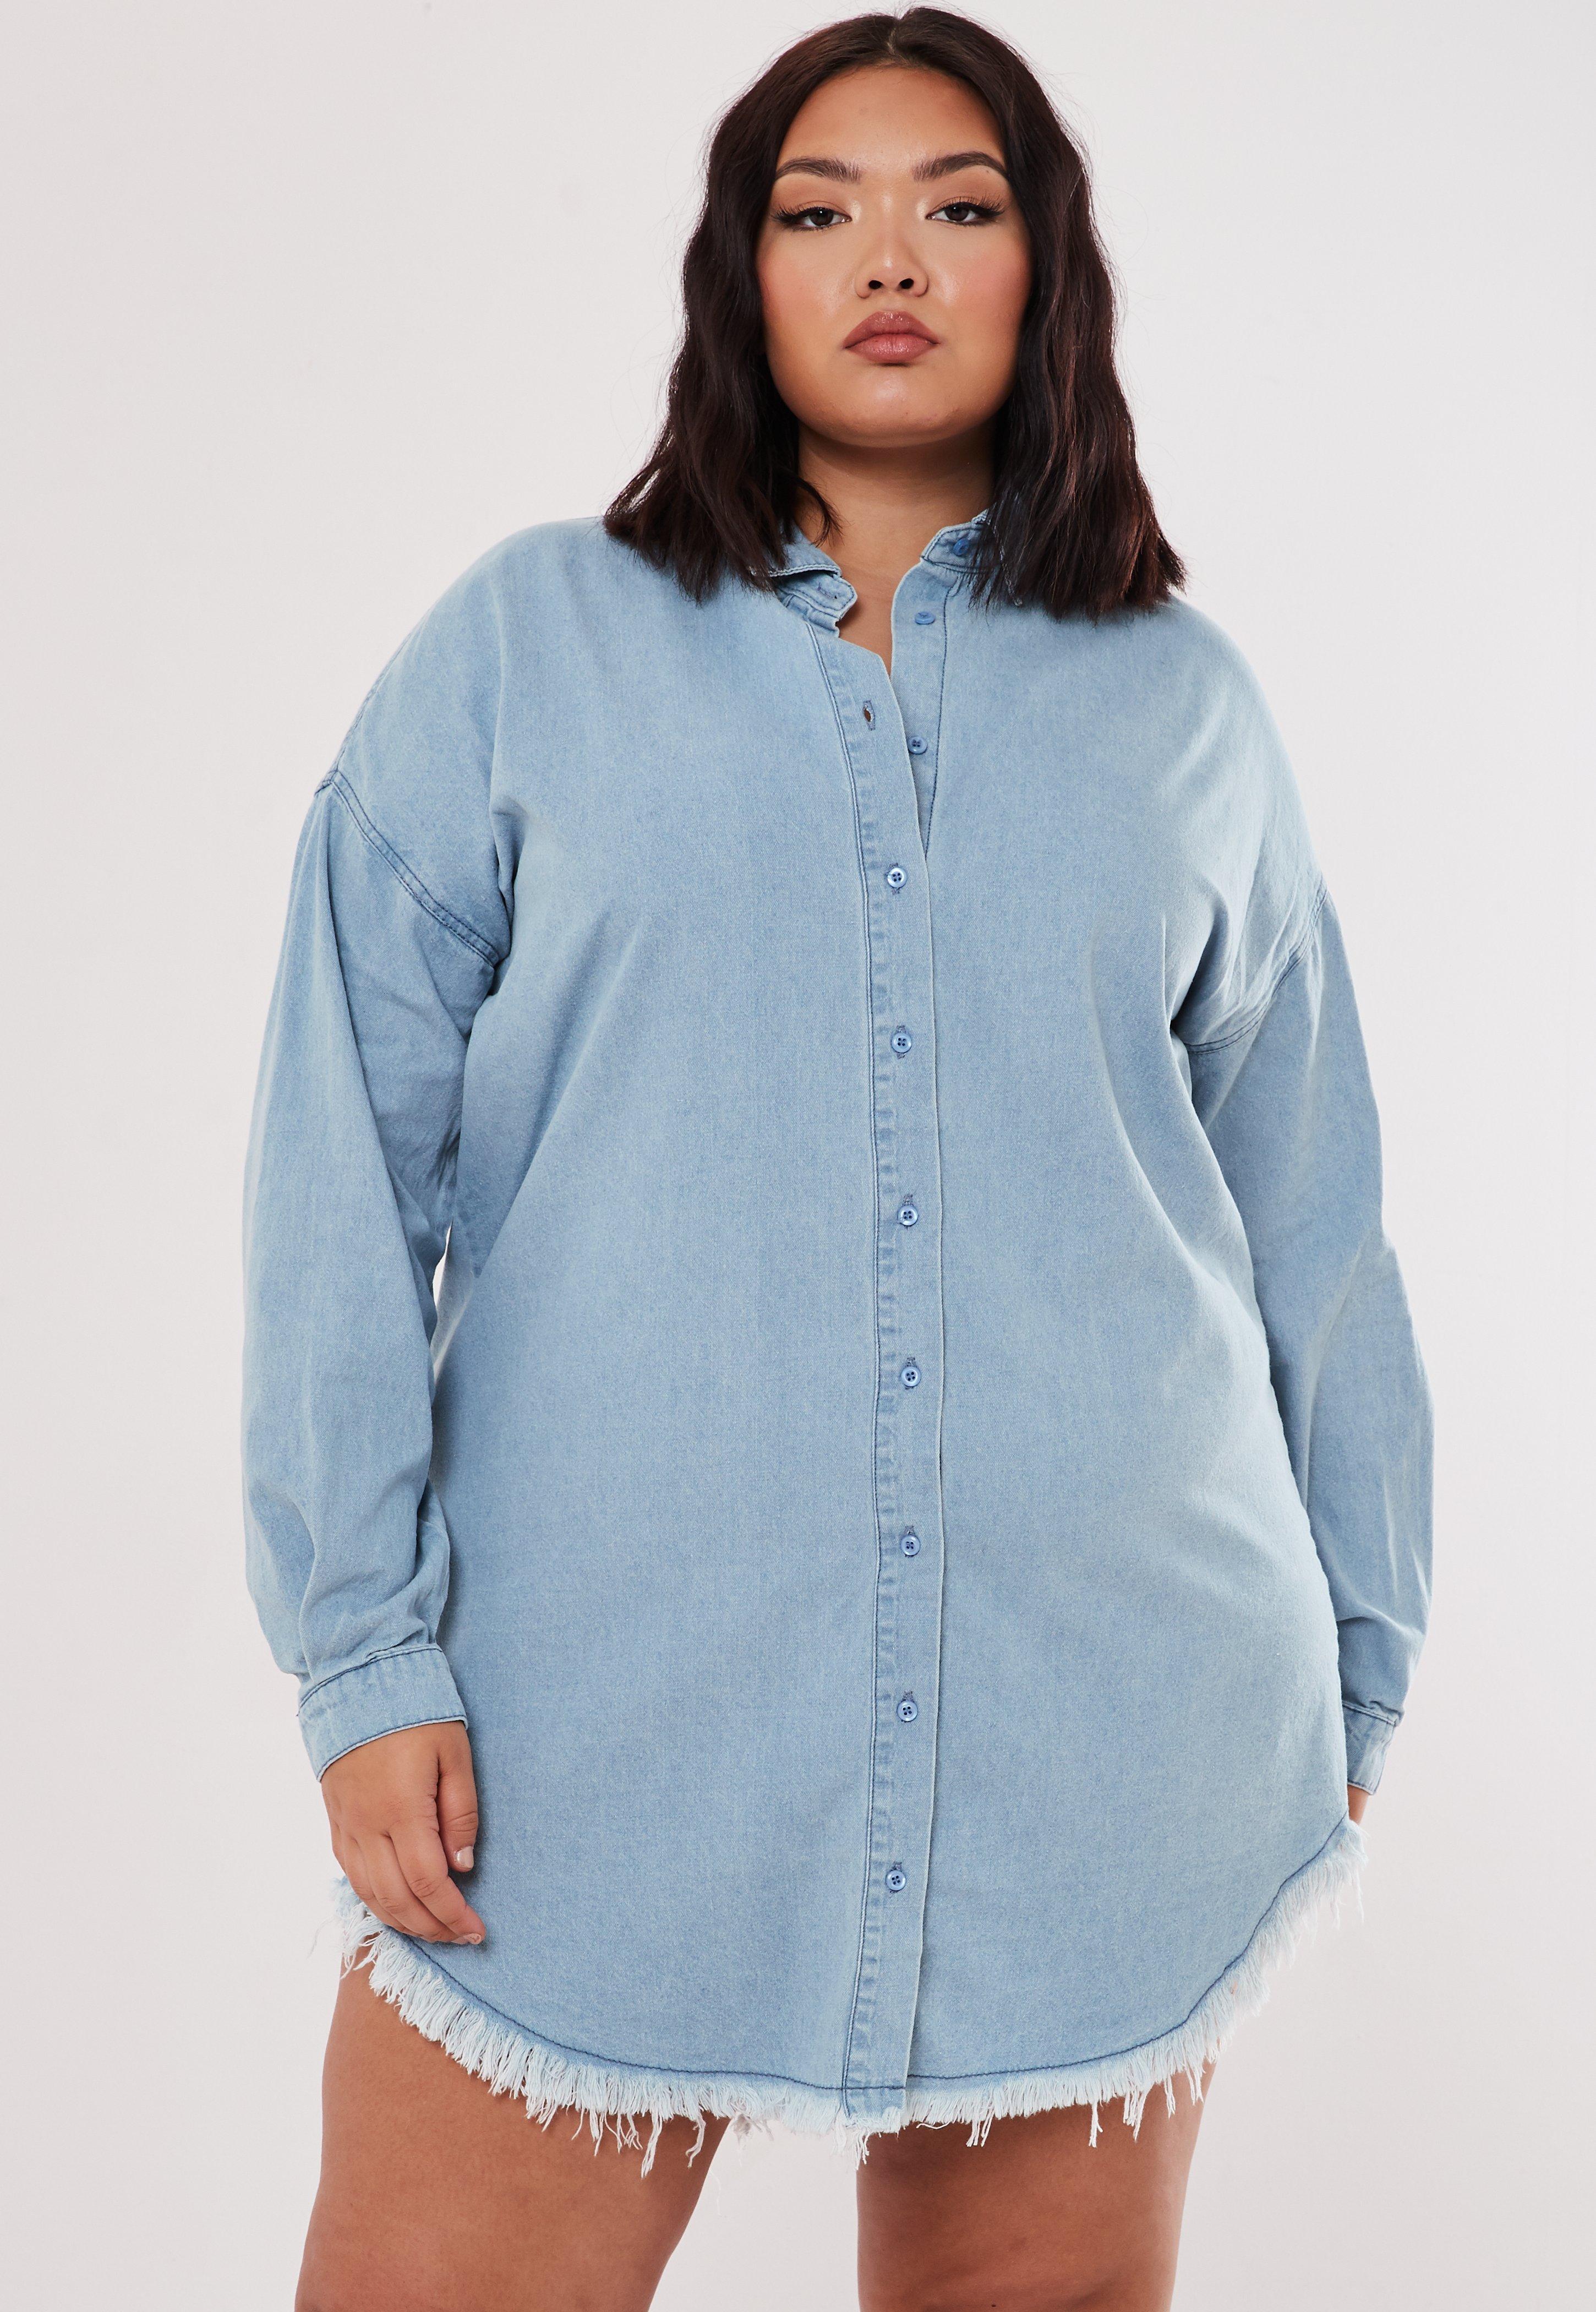 60ea46bb1 Robe chemise en jeans oversize Grandes tailles